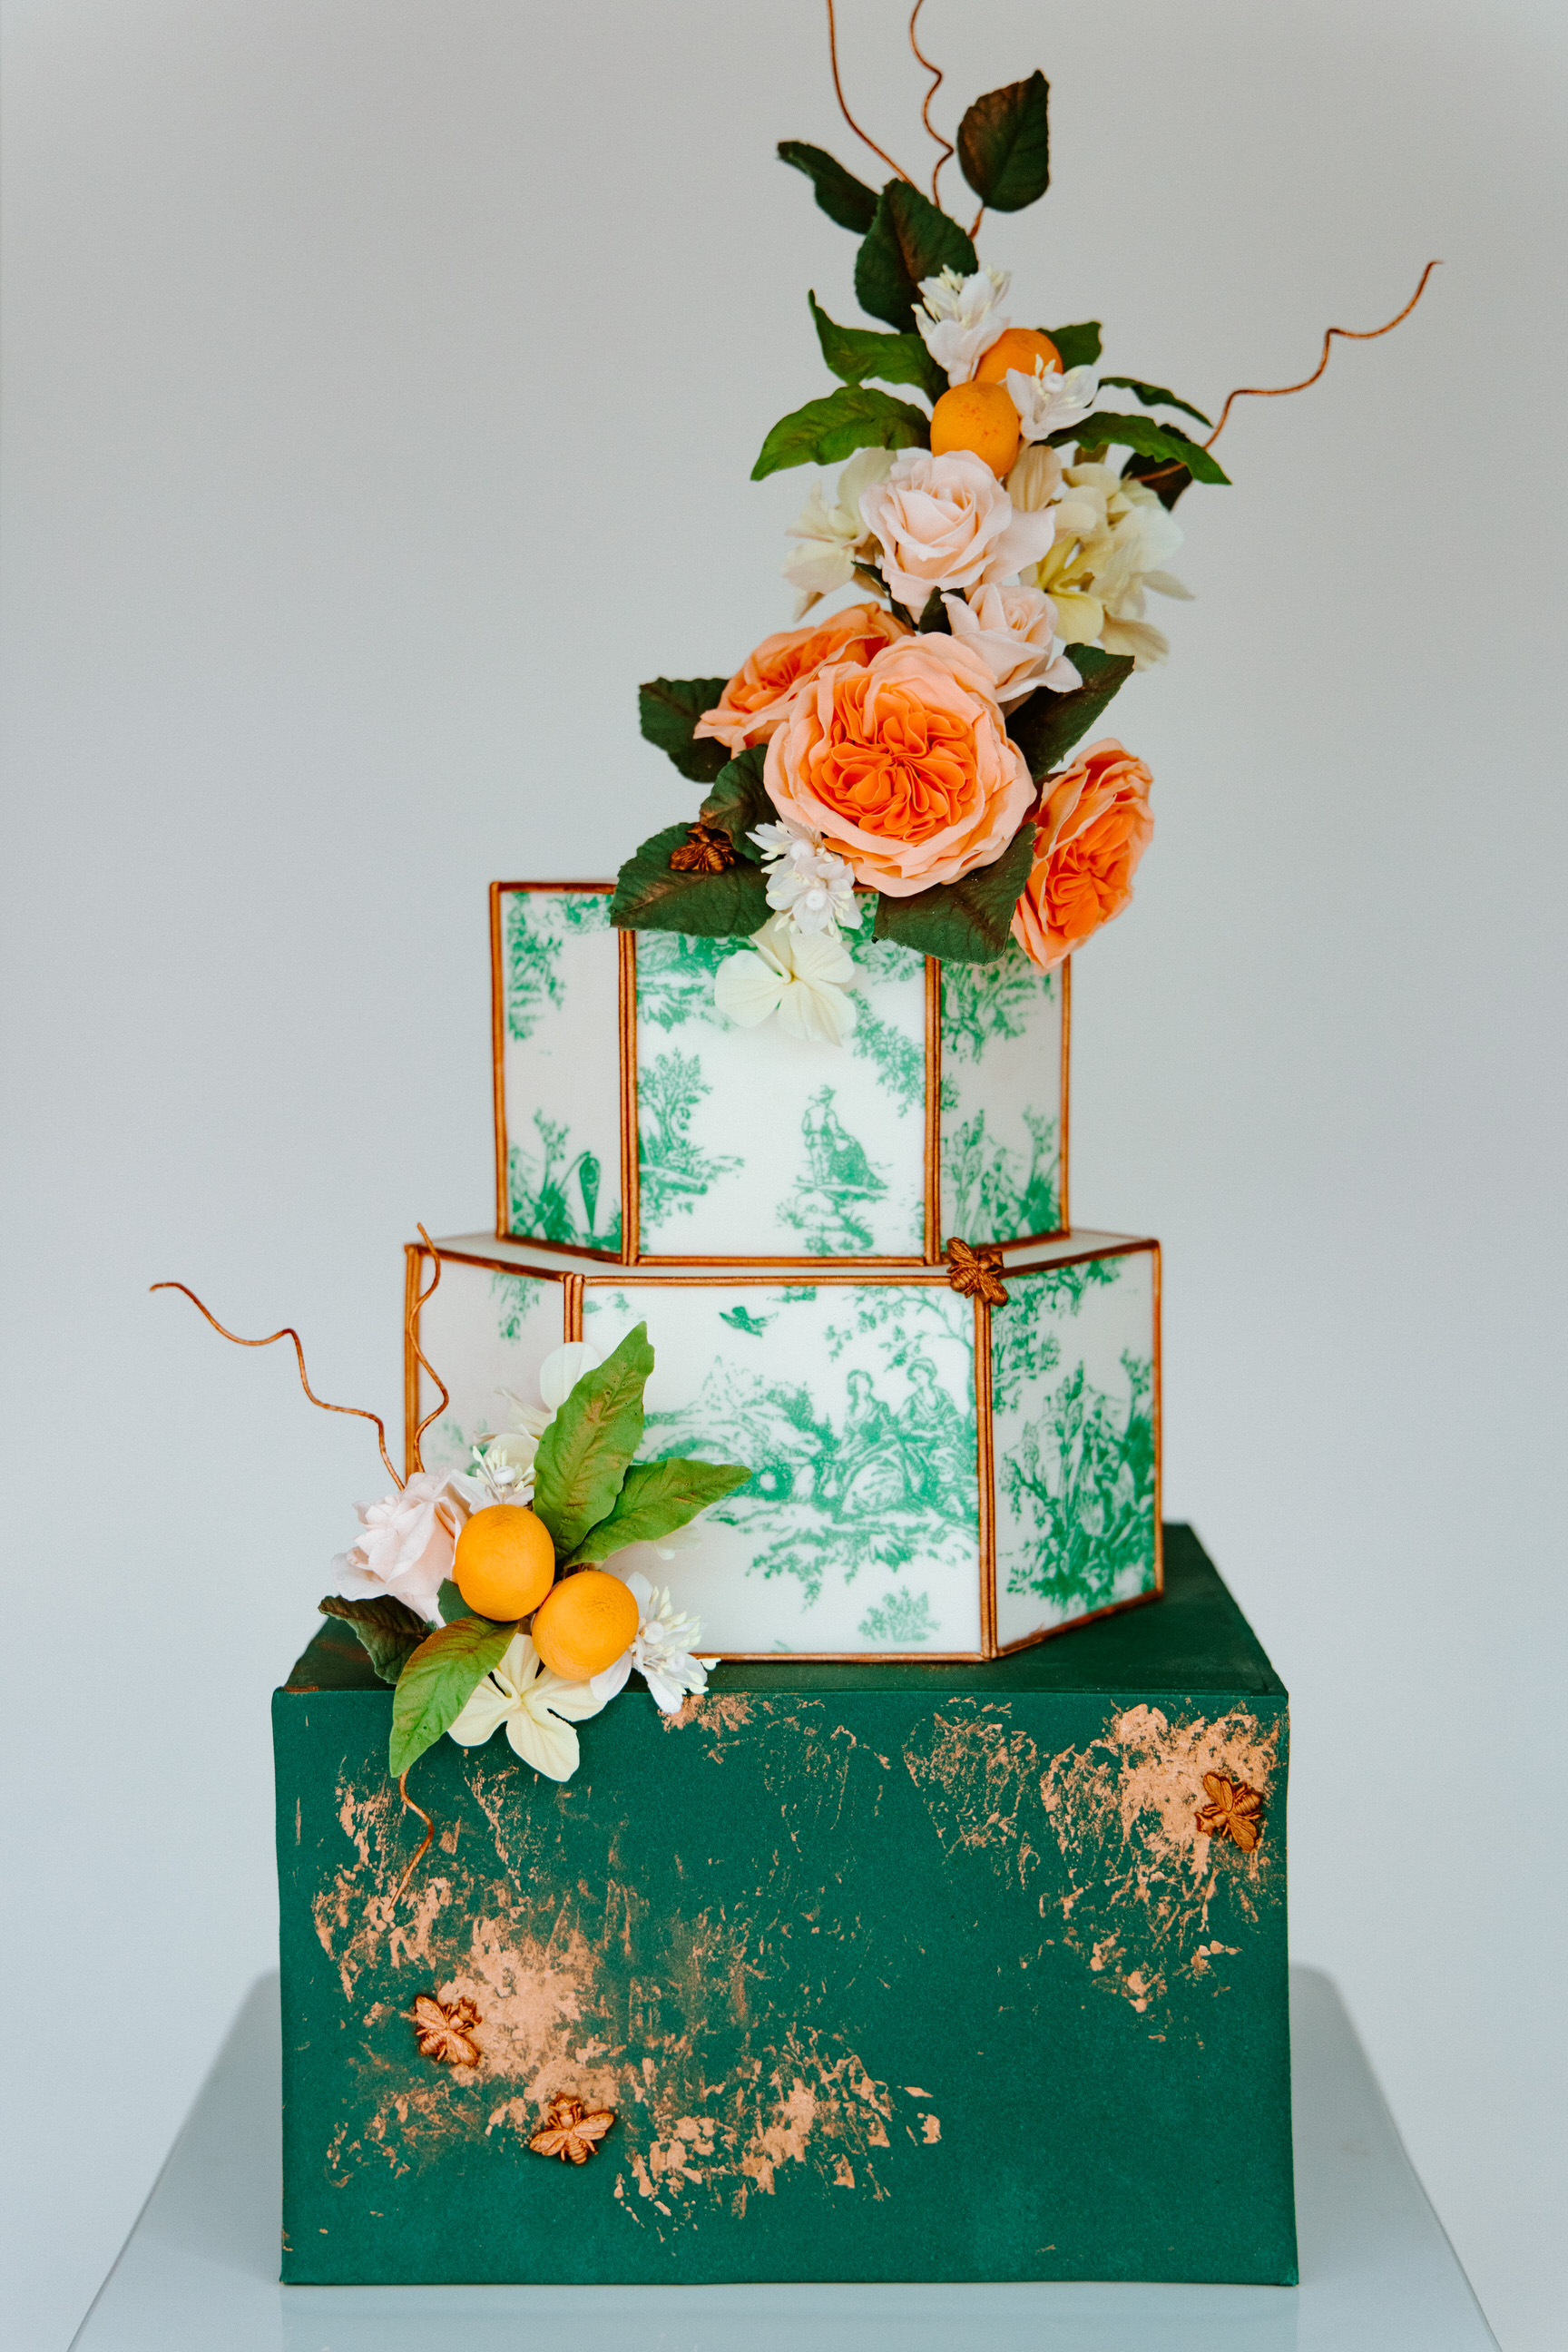 gateaux-cake-7353.jpg